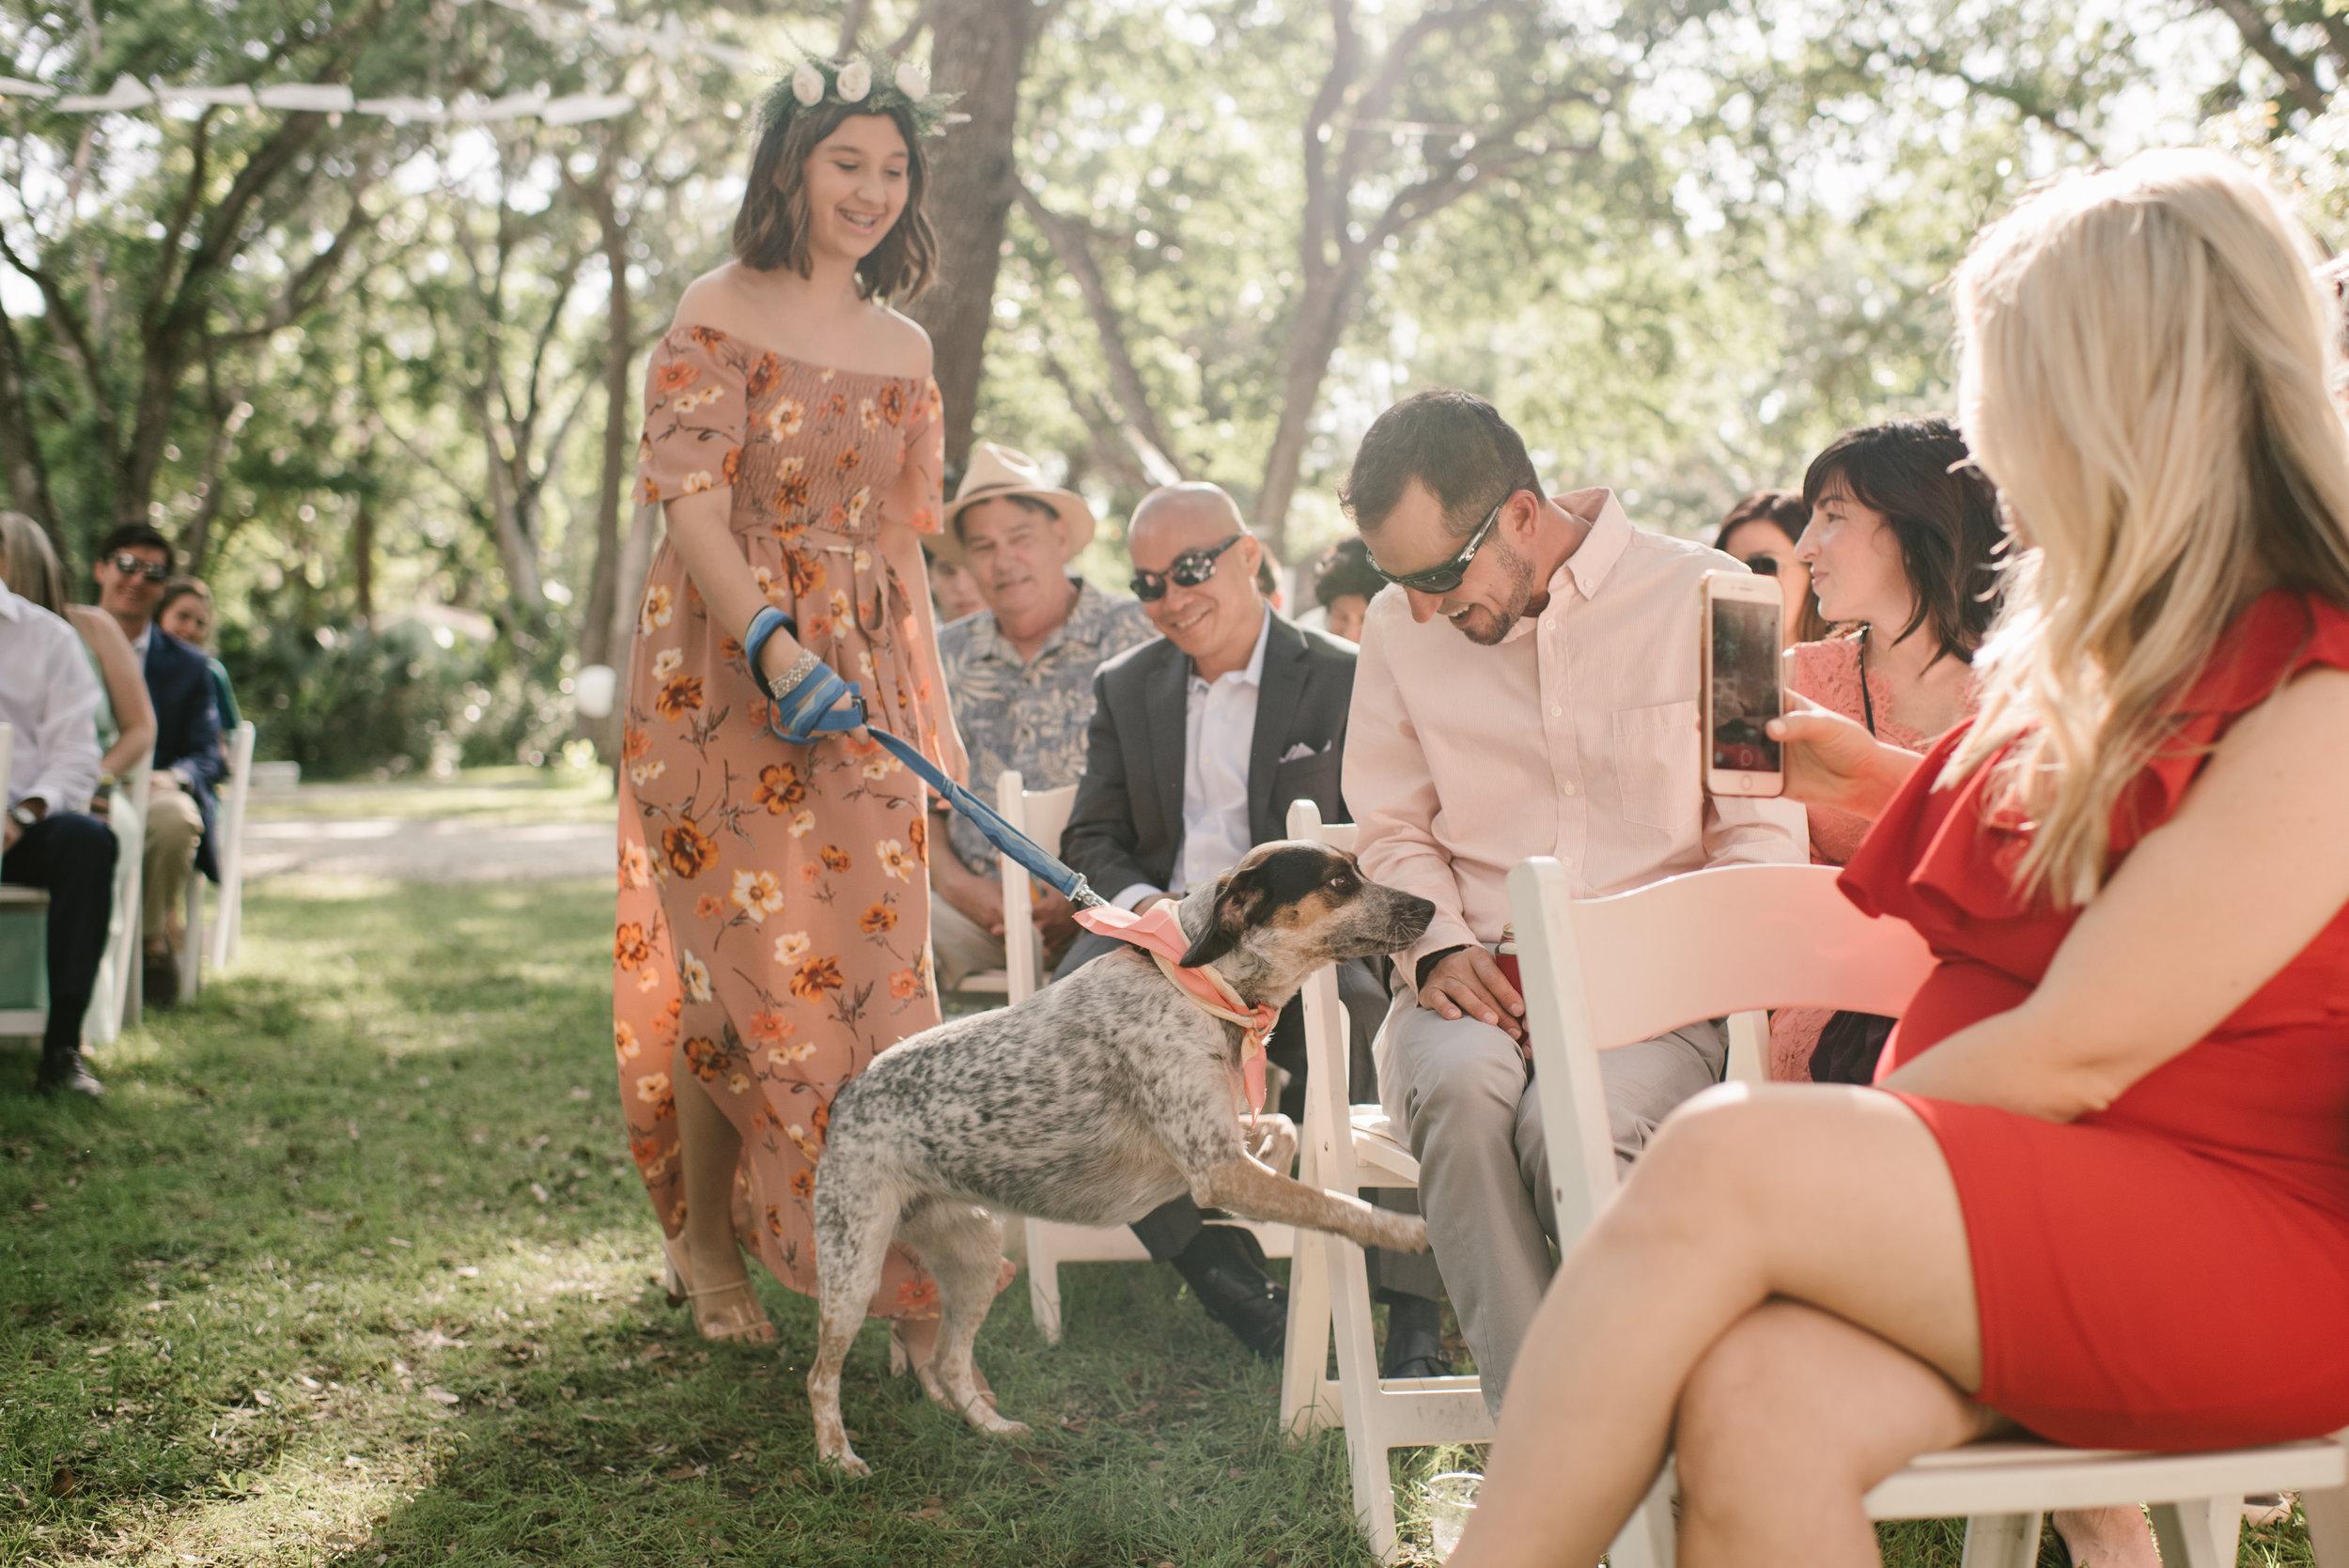 mclaughlin-wedding-433.jpg